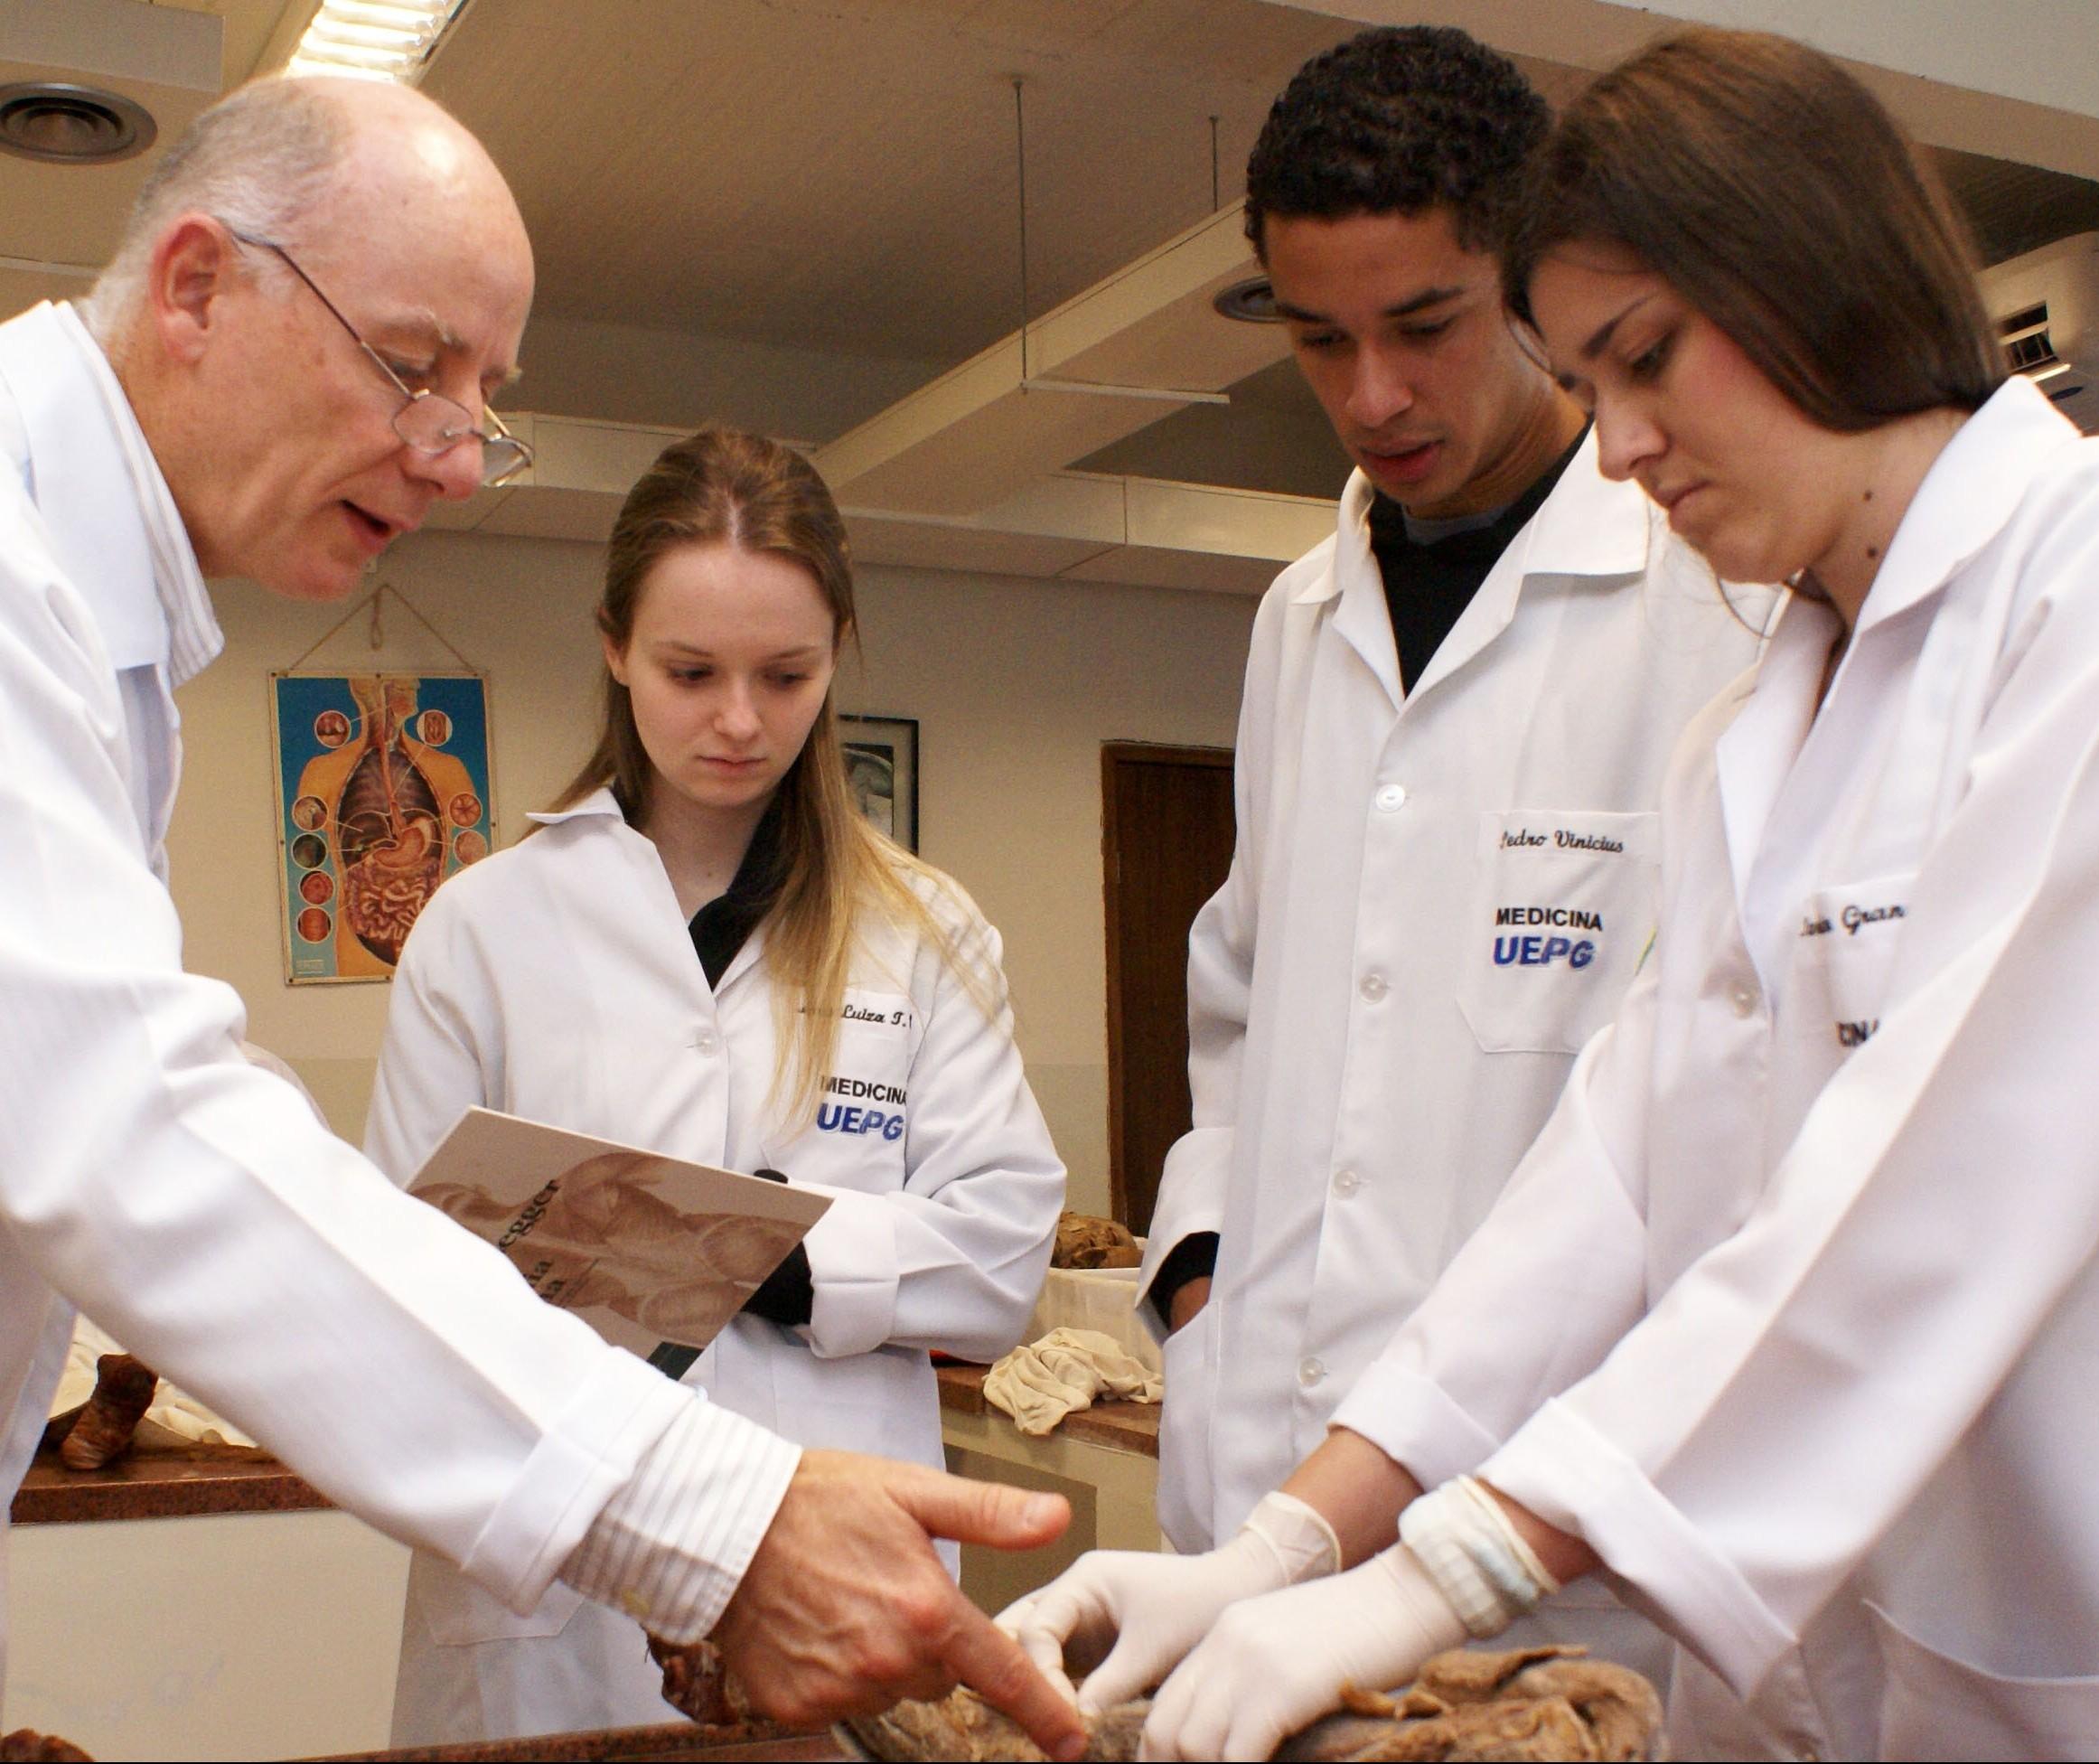 Alunos de Medicina querem antecipar formatura para ajudar na luta contra a Covid-19